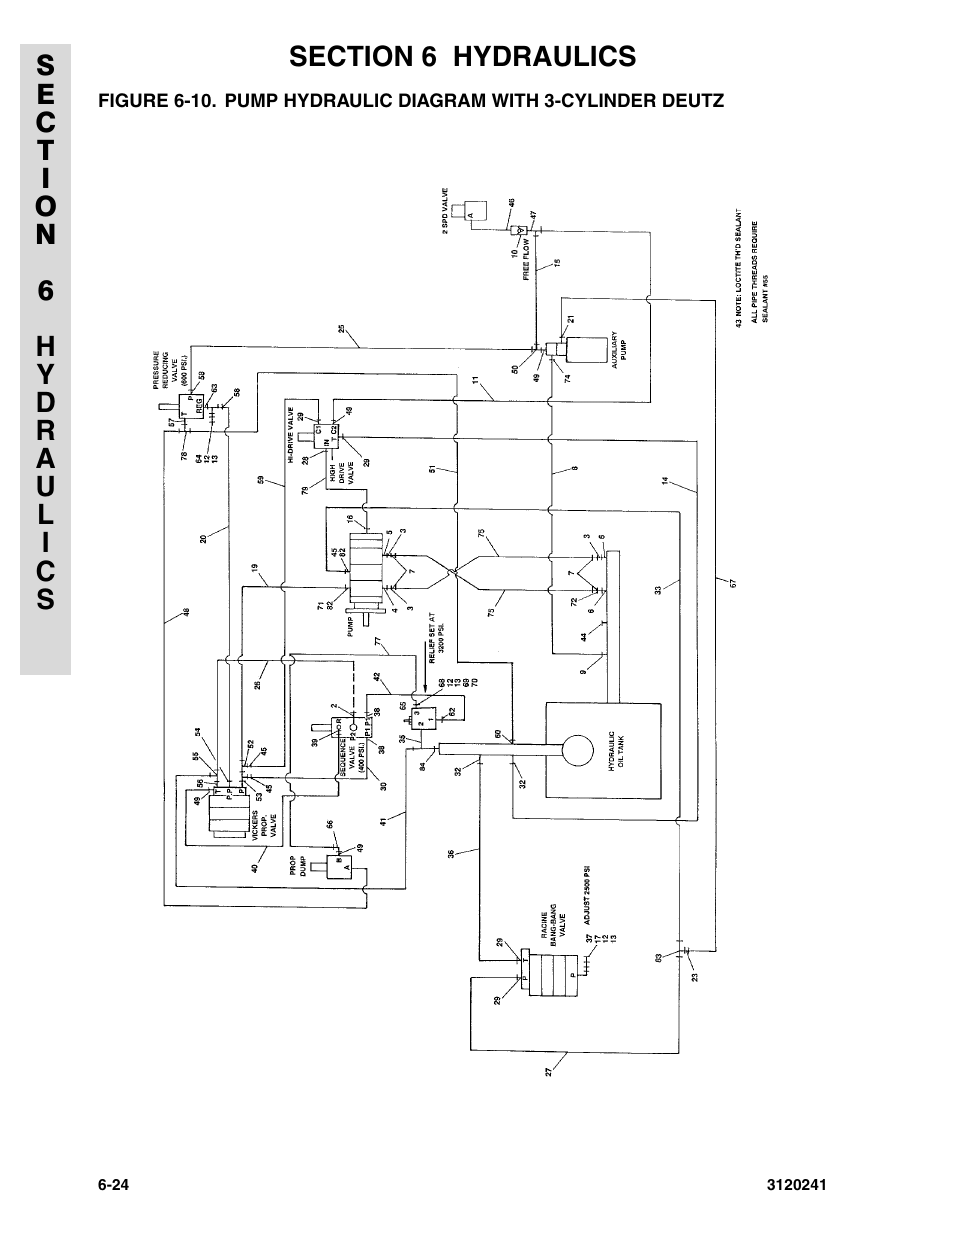 Diagram 8 Polaris Atv Emprendedor Free Online Image Schematic Wiring